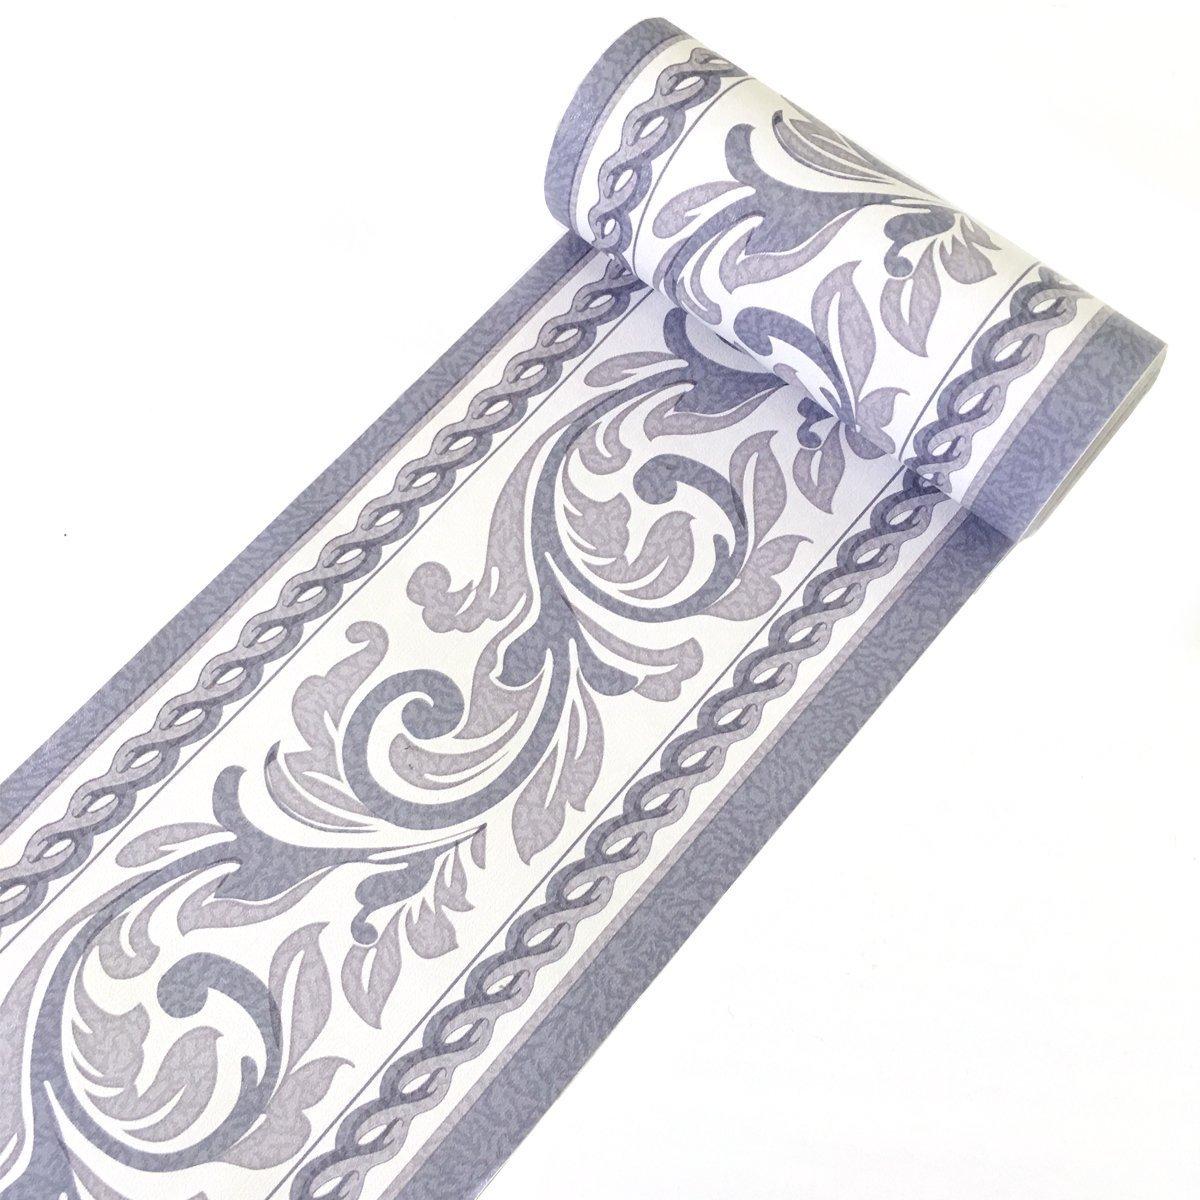 Amazon Com Yifely Moistureproof Pvc Wallpaper Border Peel Stick